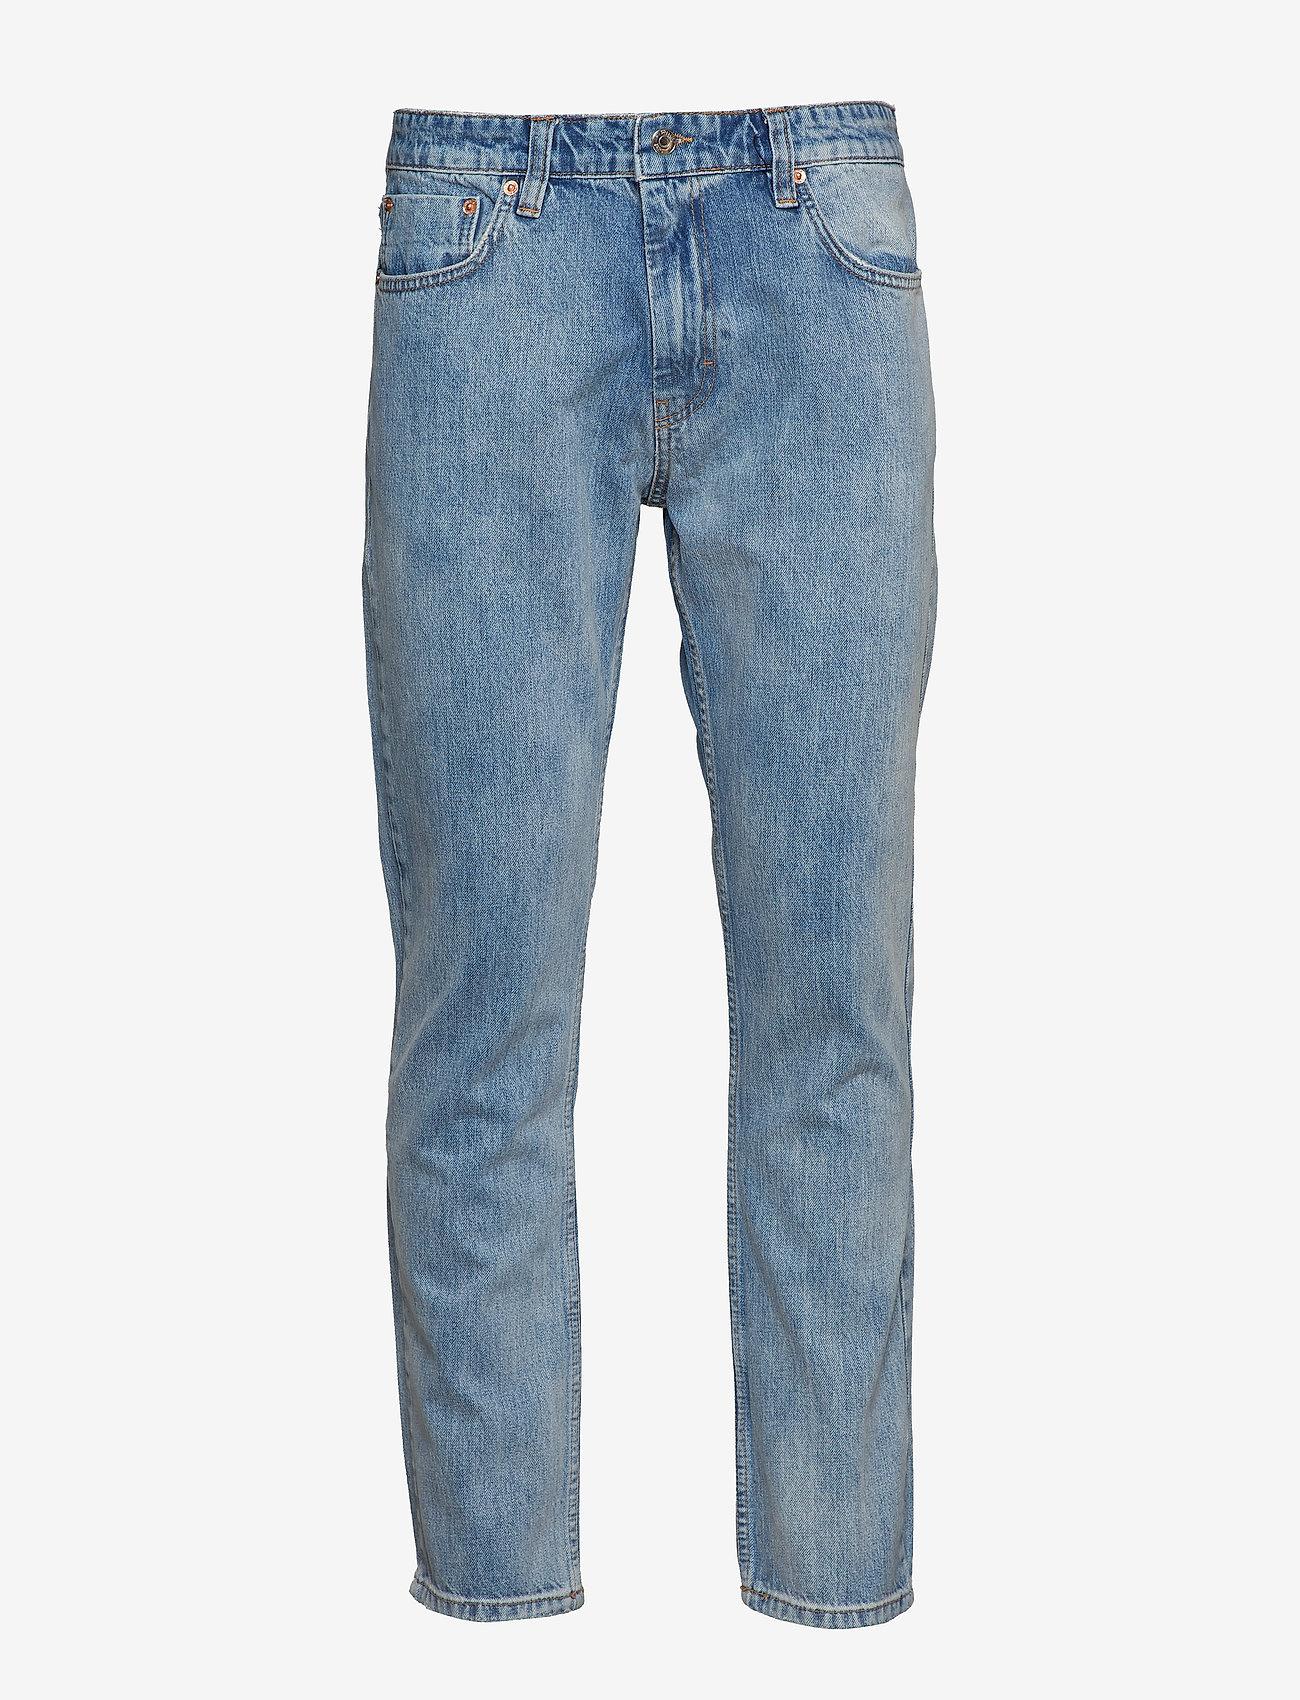 Just Junkies - King Supply Blue - slim jeans - supply blue